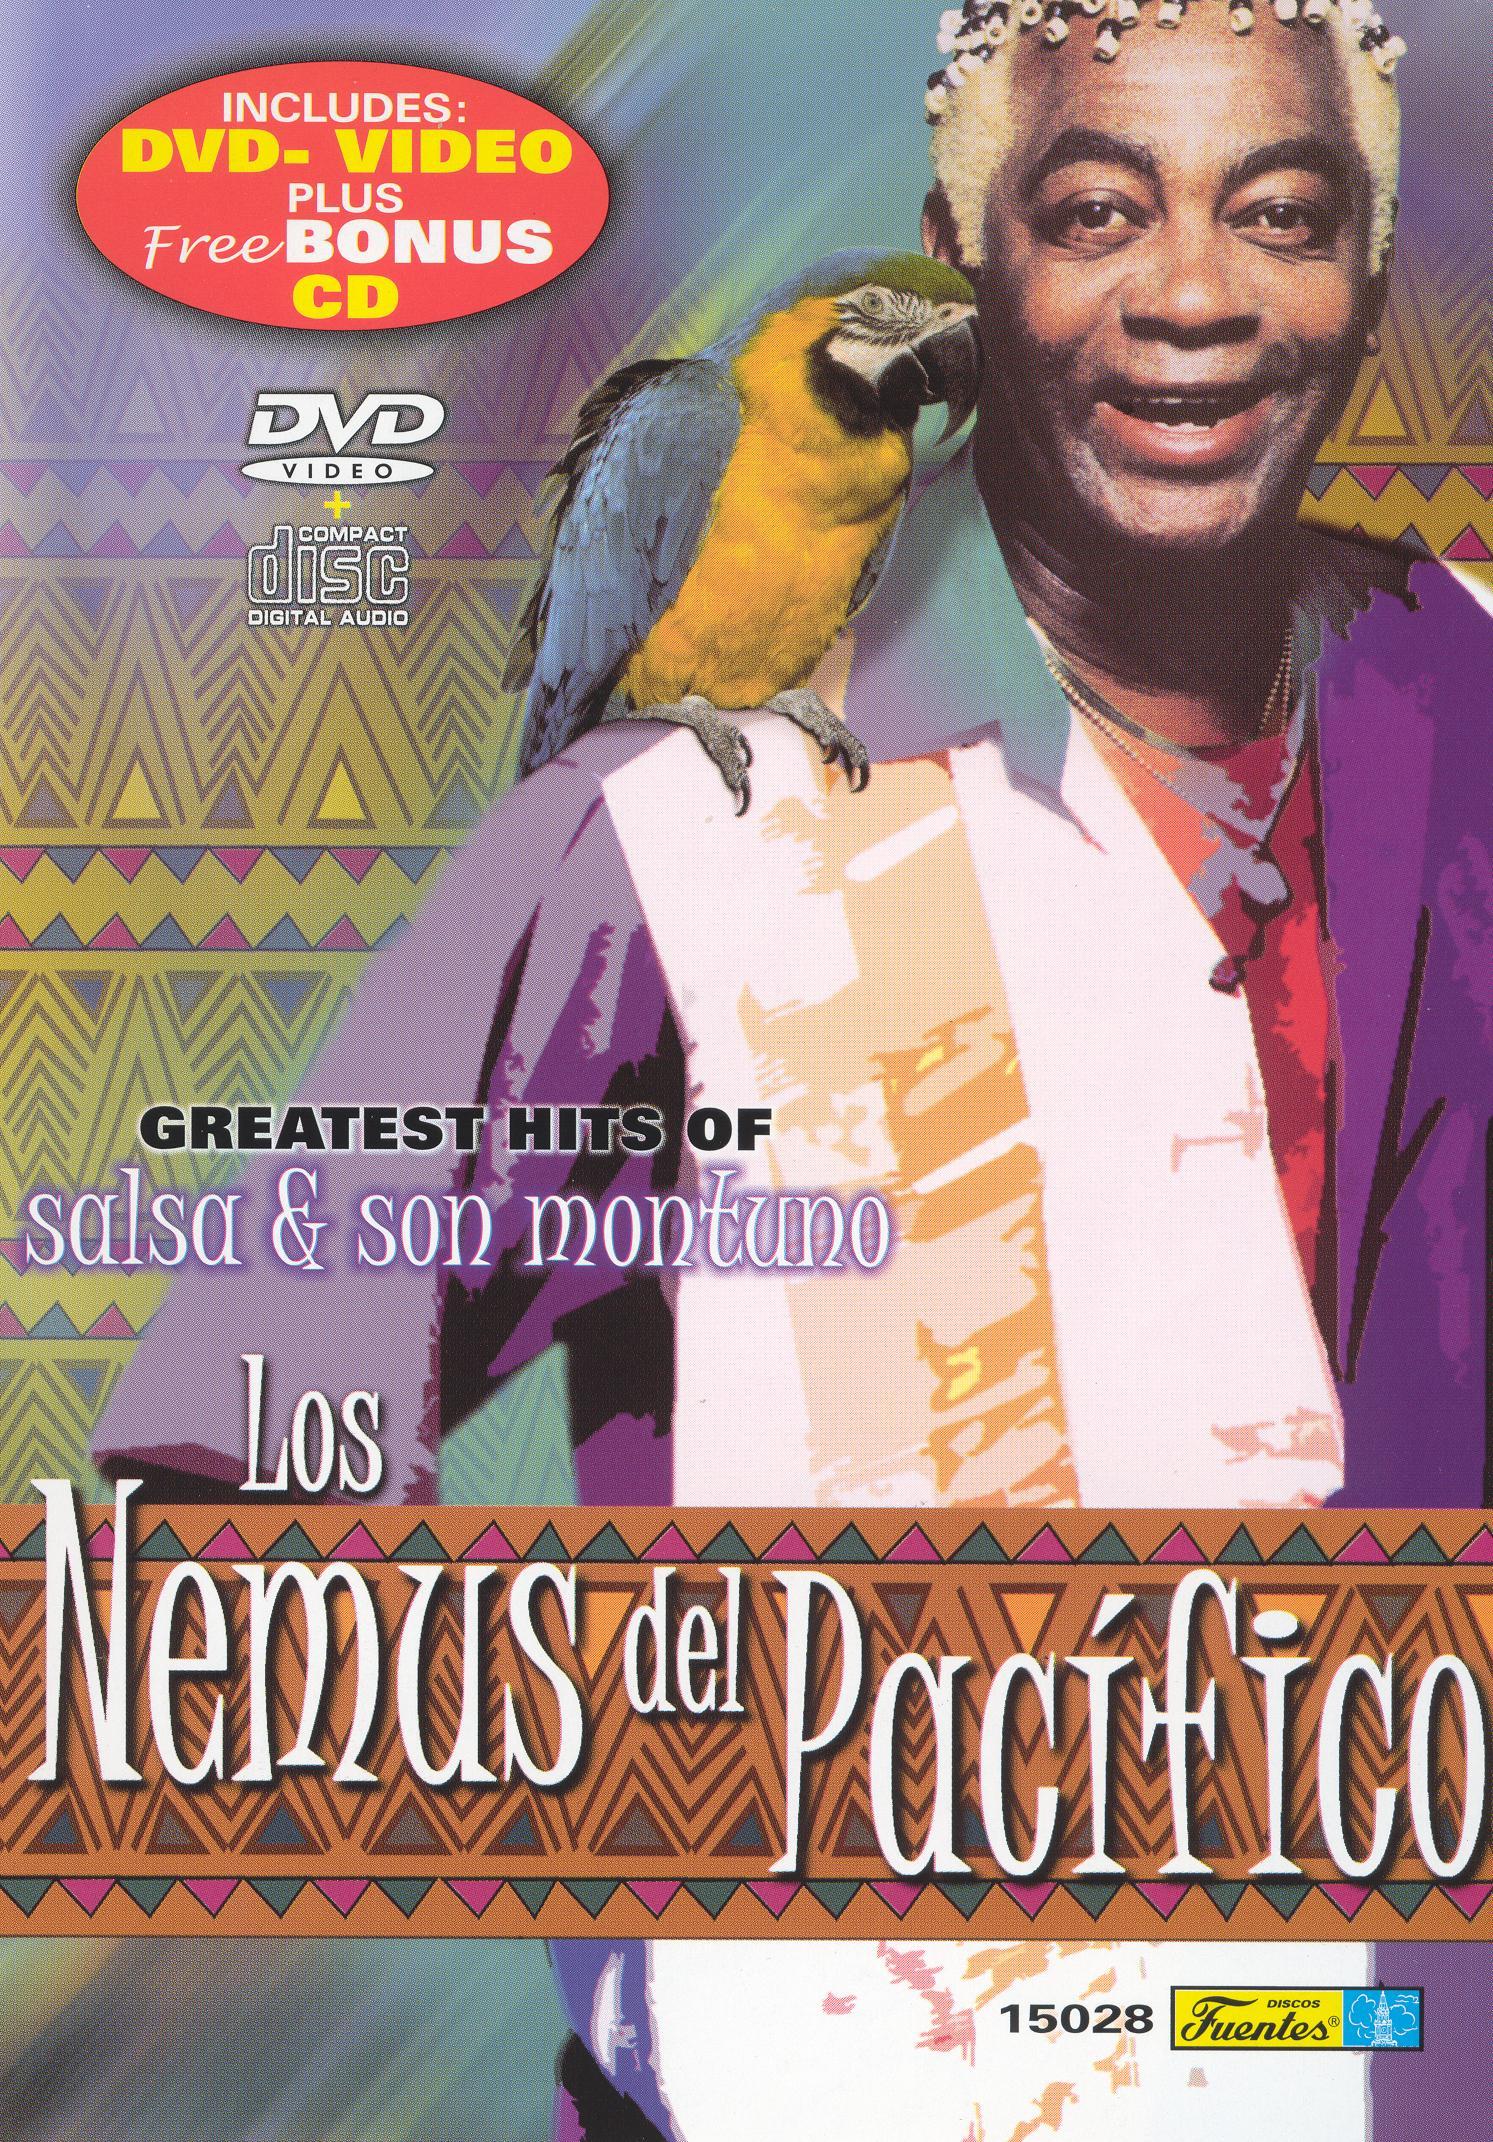 Los Nemus del Pacifico: Greatest Hits of Salsa & Son Montuno